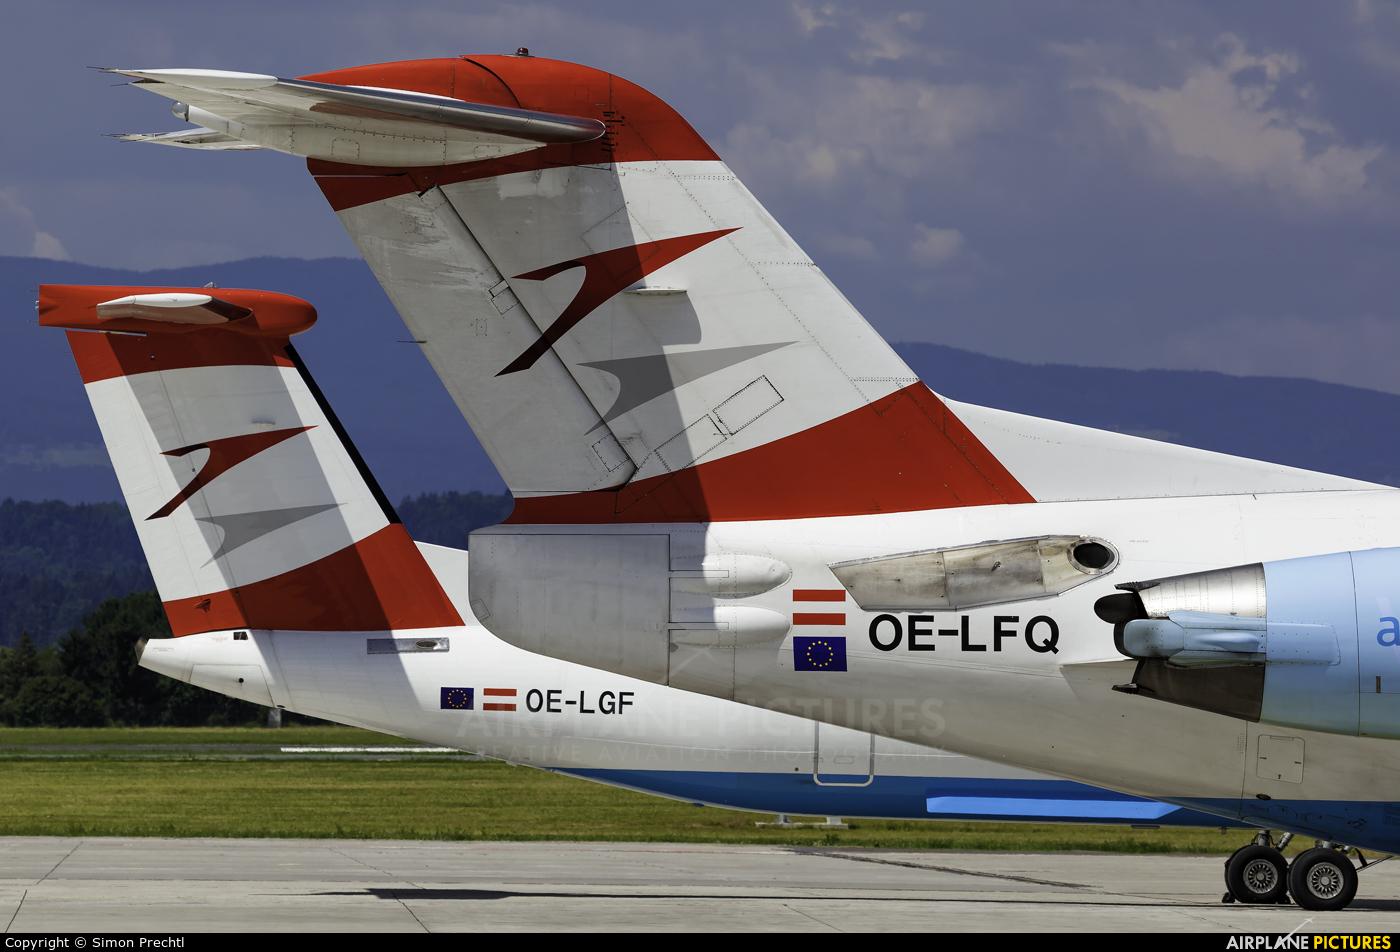 Austrian Airlines/Arrows/Tyrolean OE-LFQ aircraft at Graz